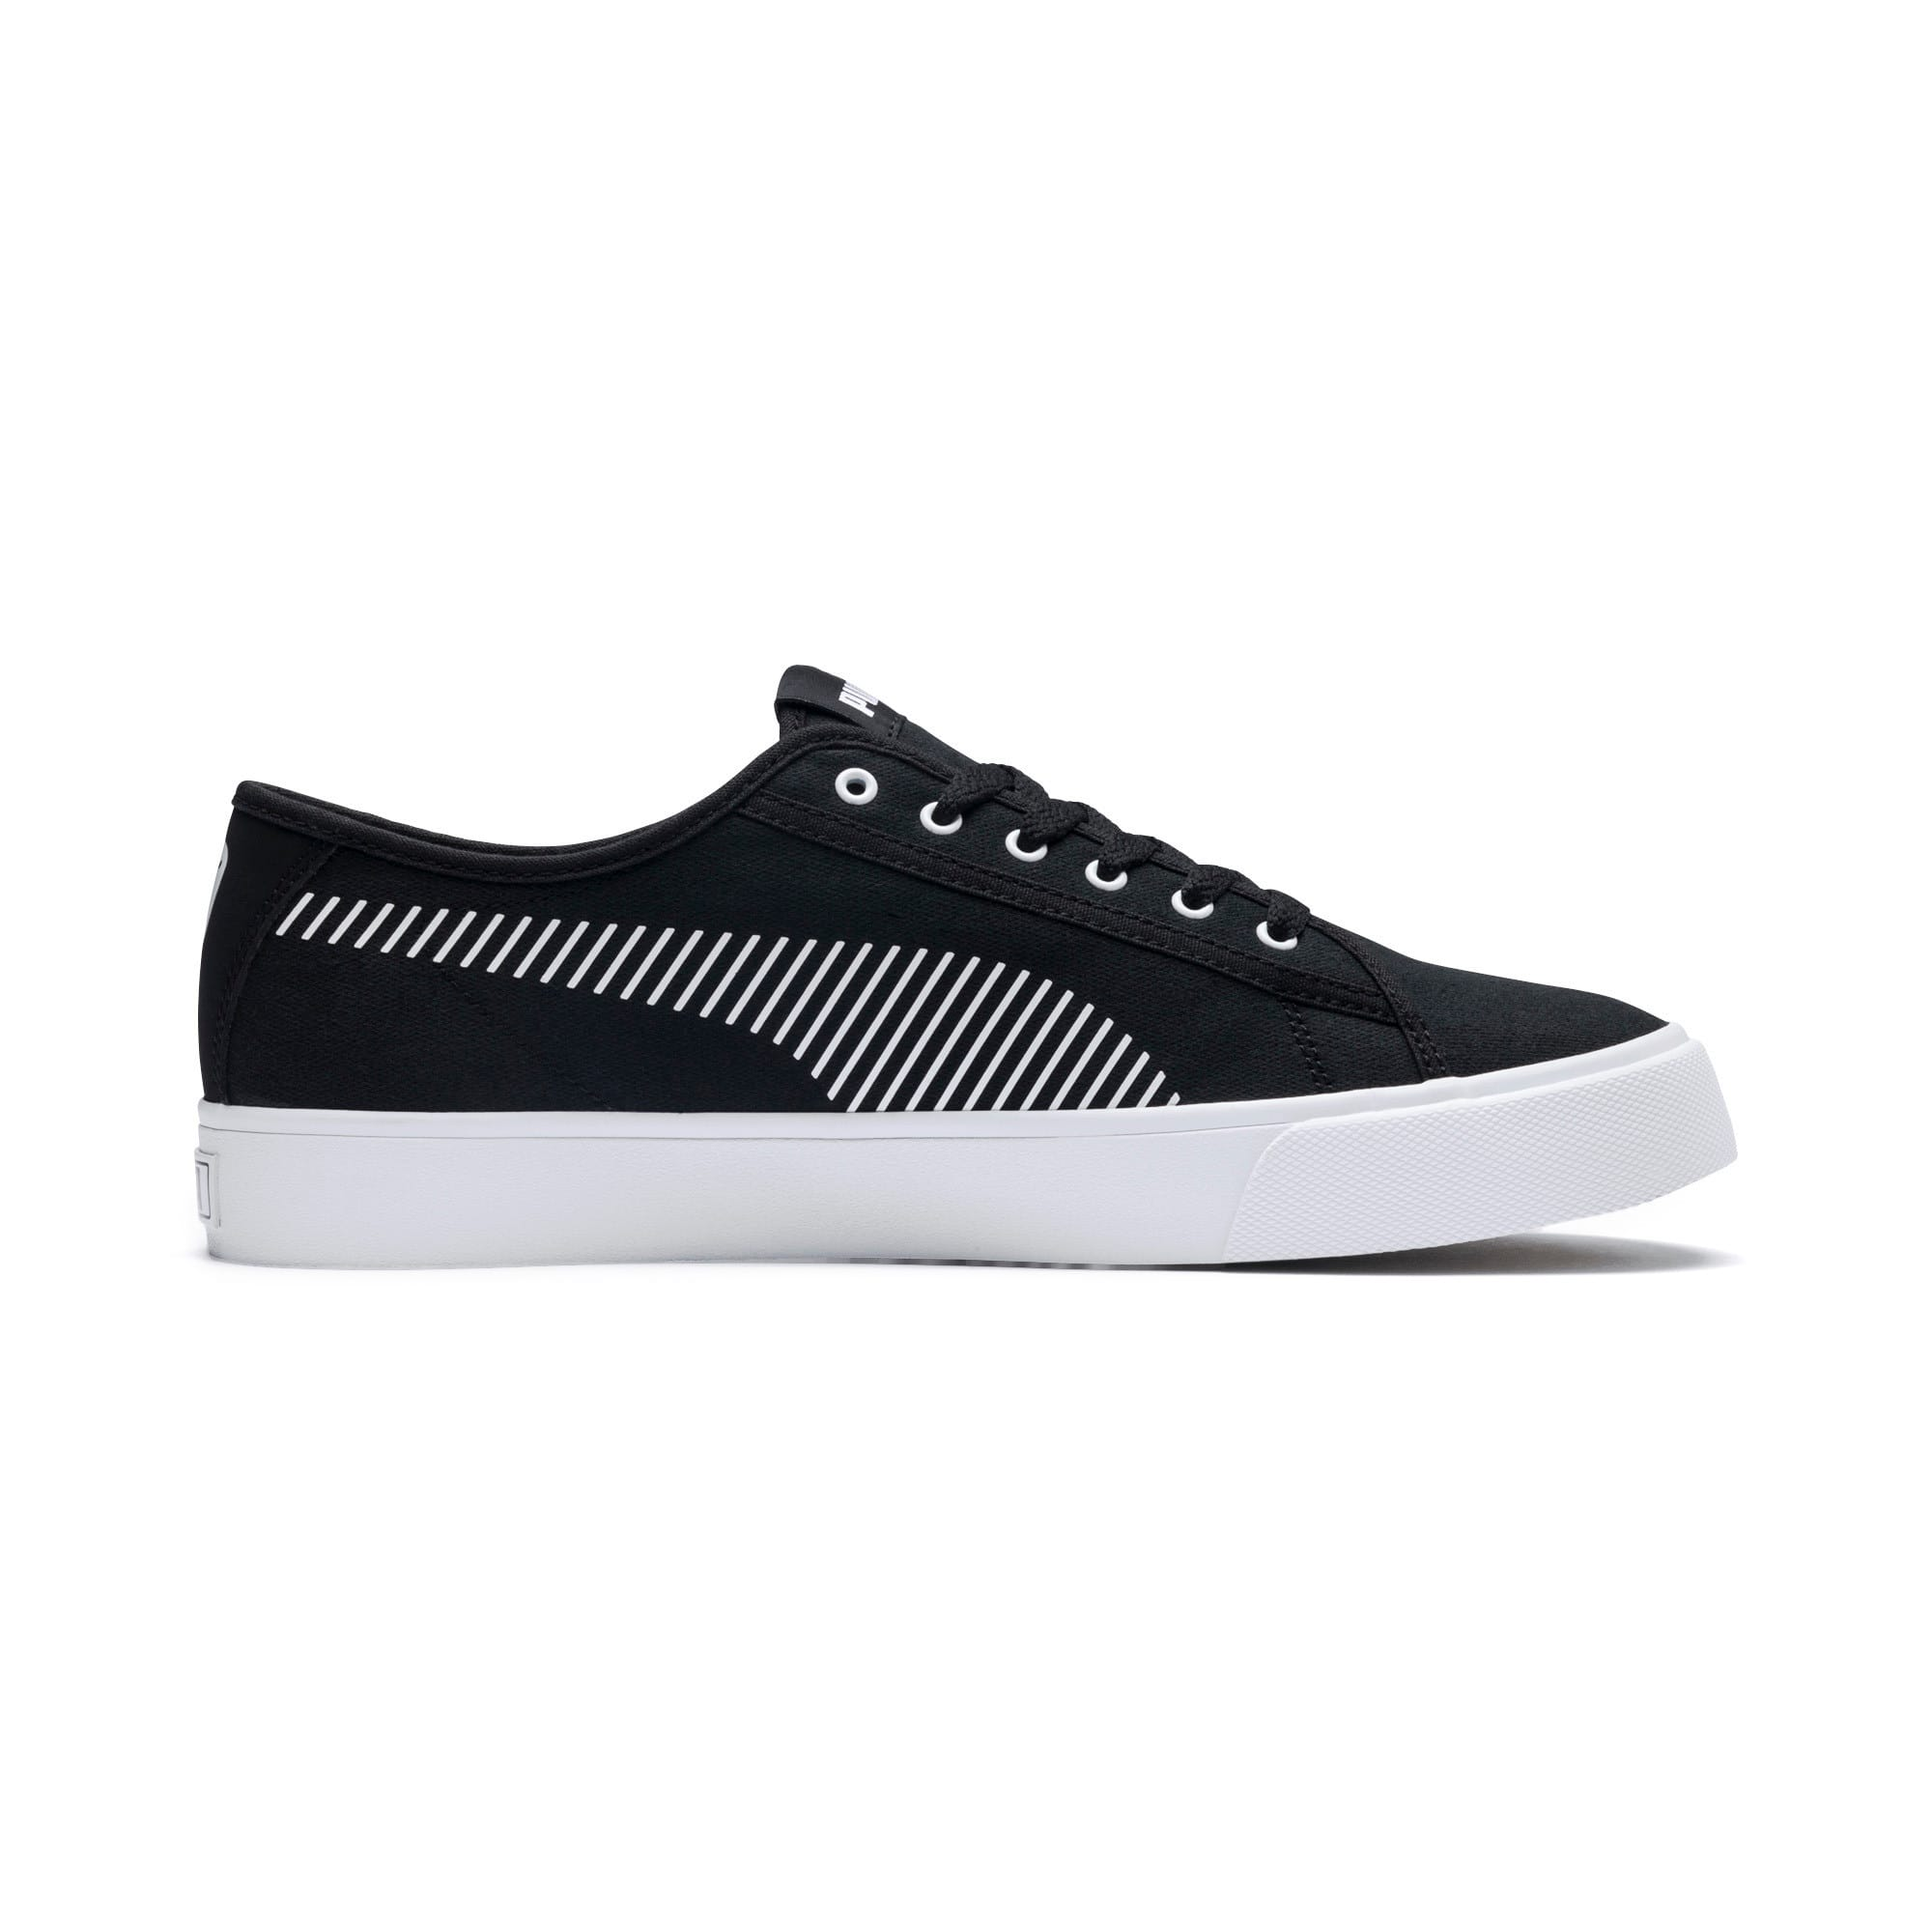 Thumbnail 5 of Bari Sneakers, Puma Black-Puma White, medium